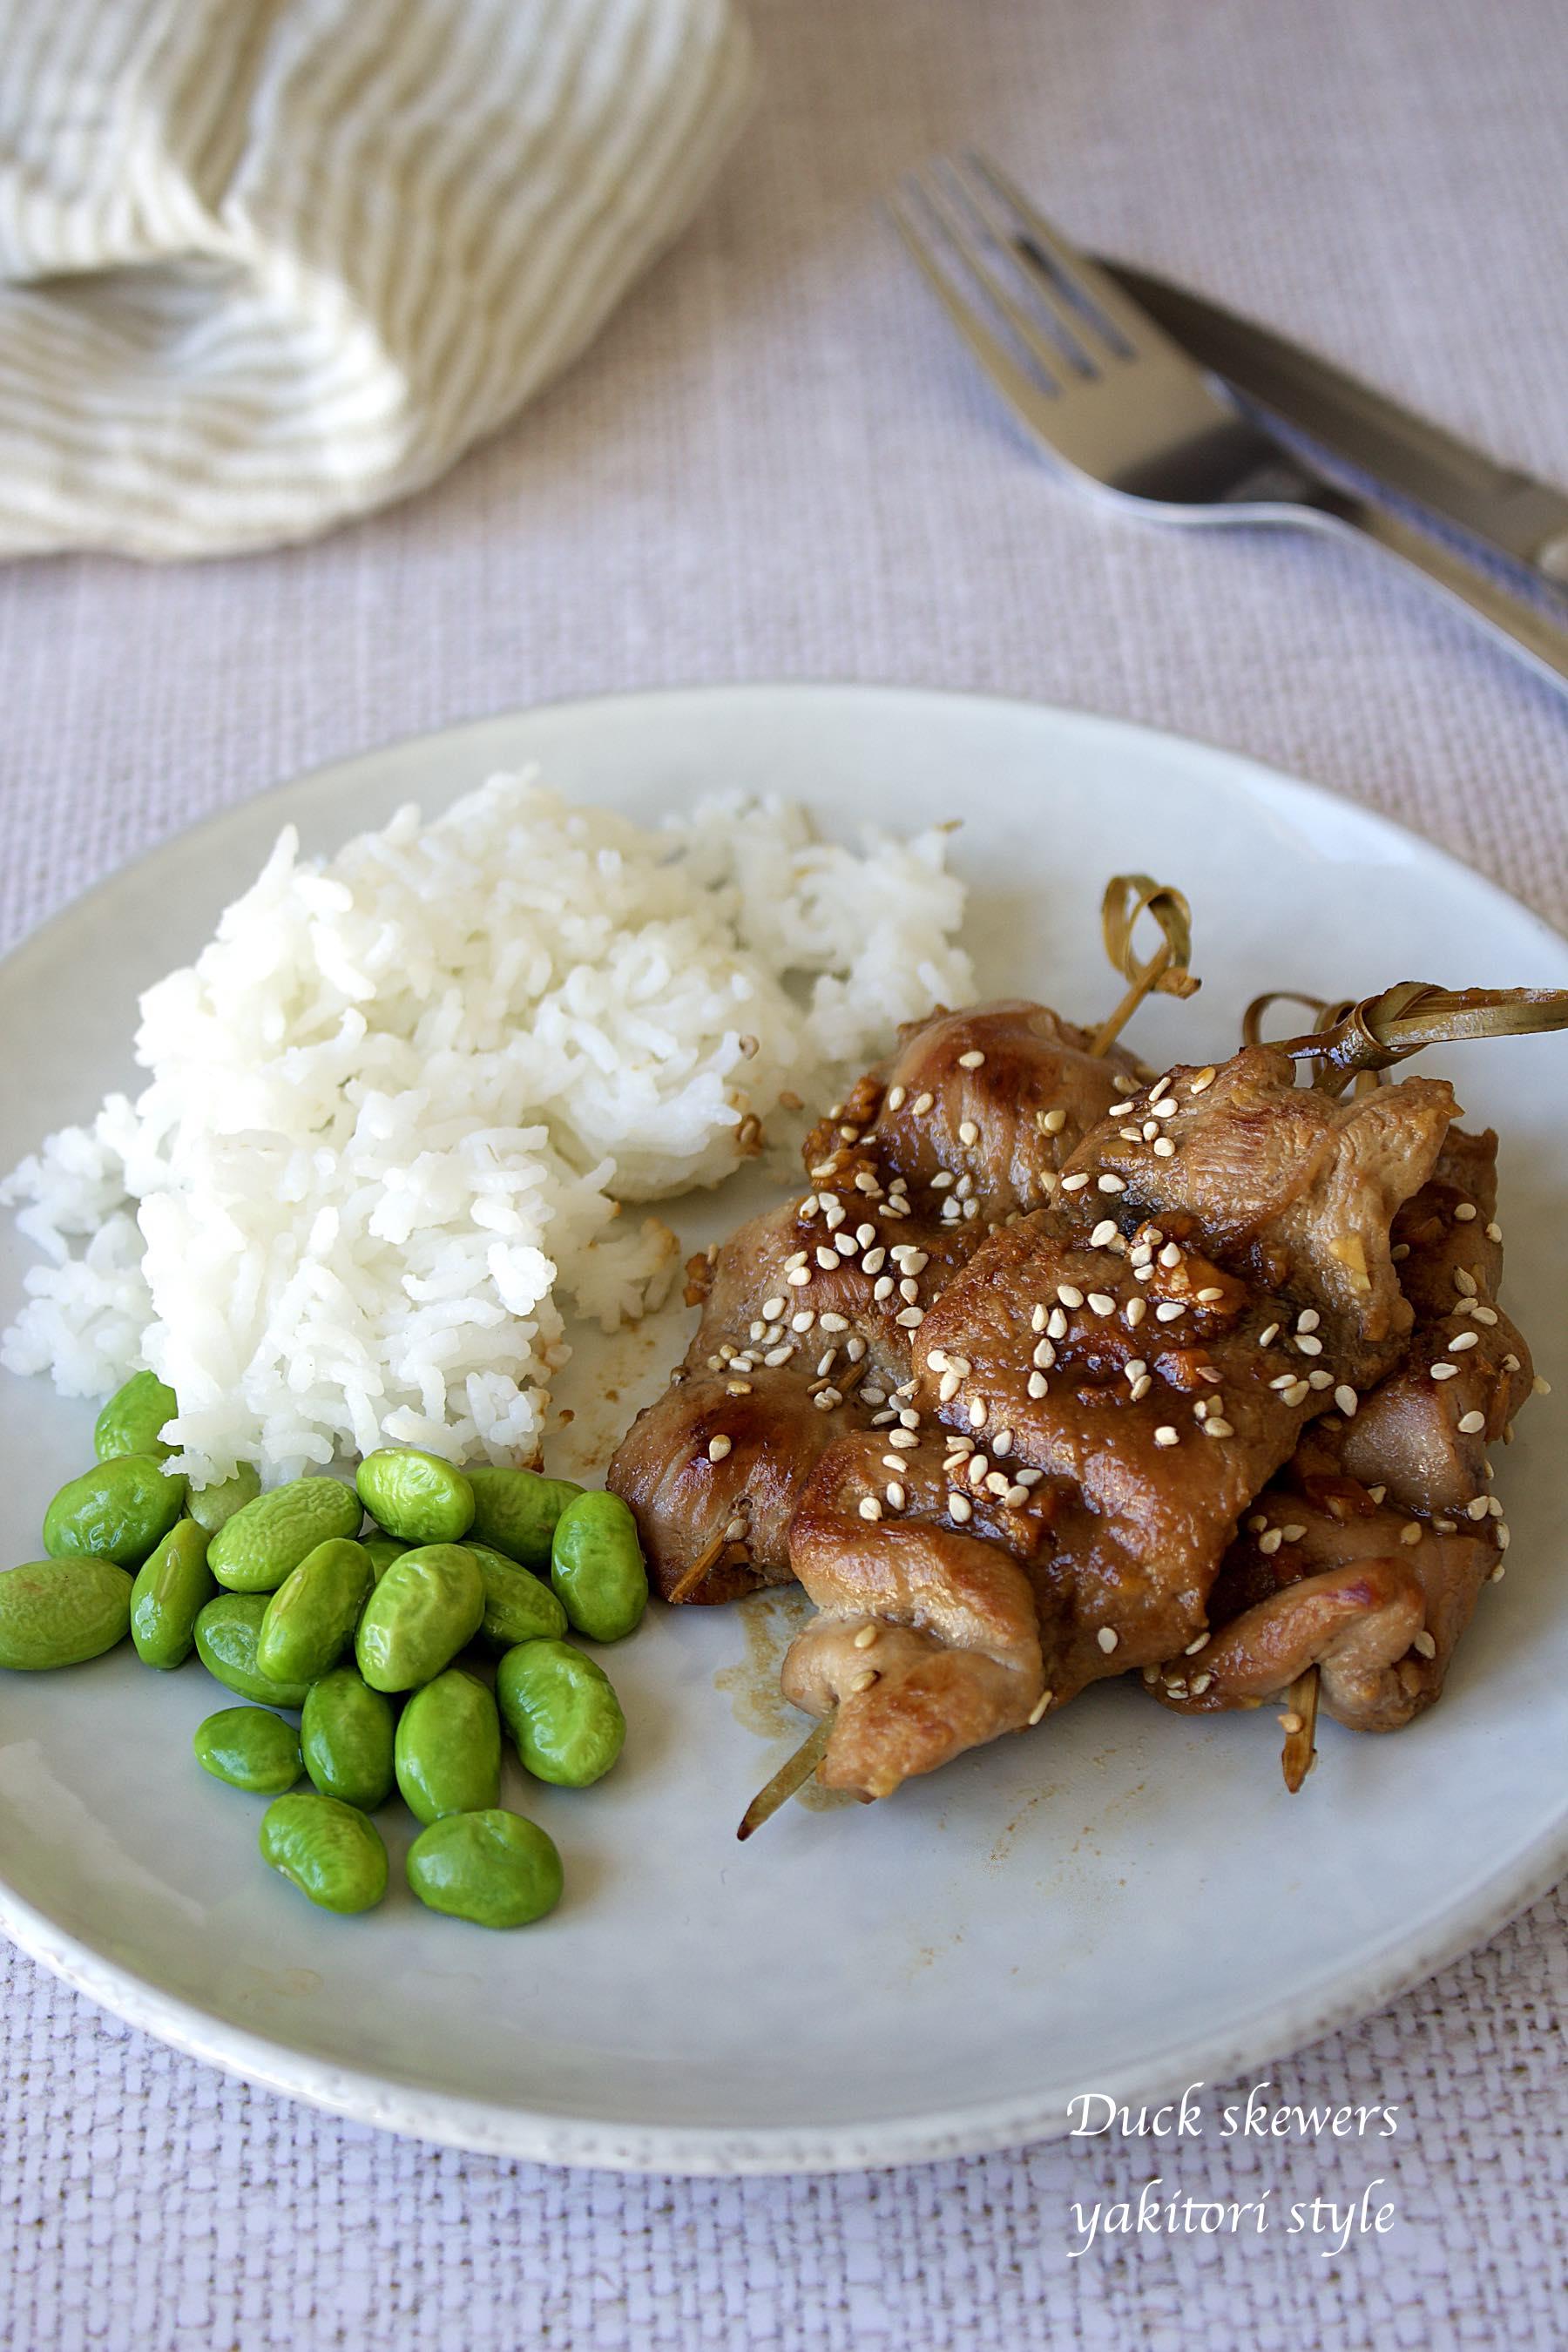 Yakitori style duck skewers